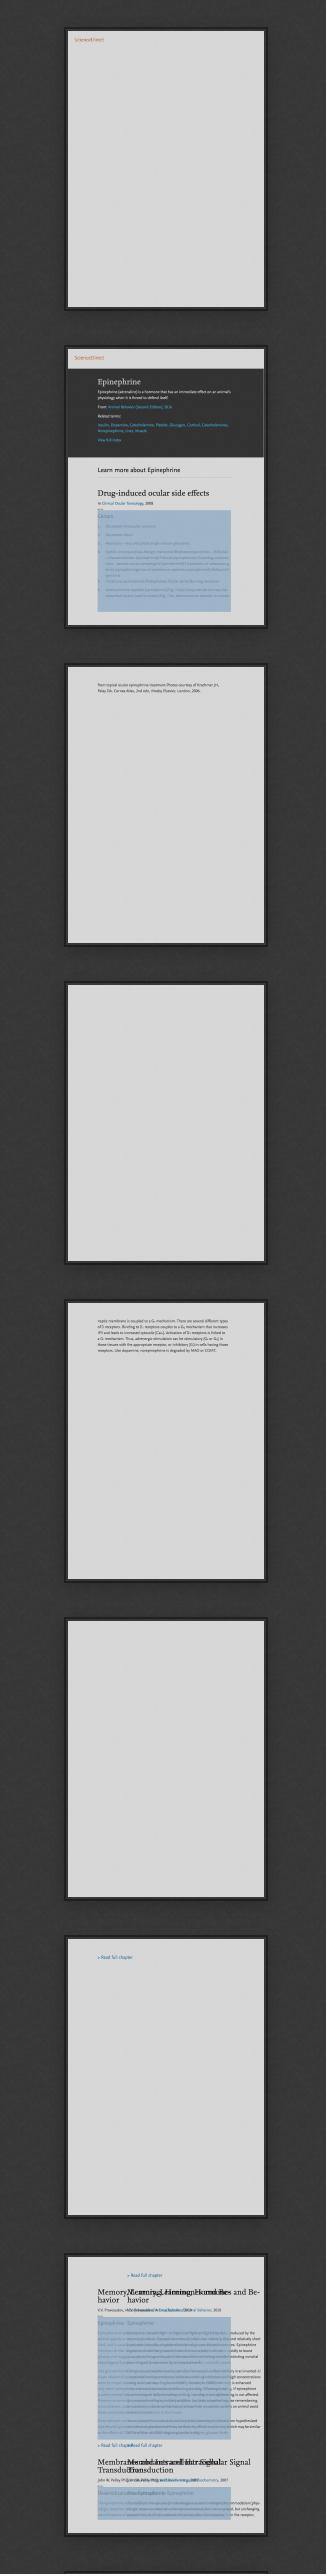 react-pdf - Bountysource